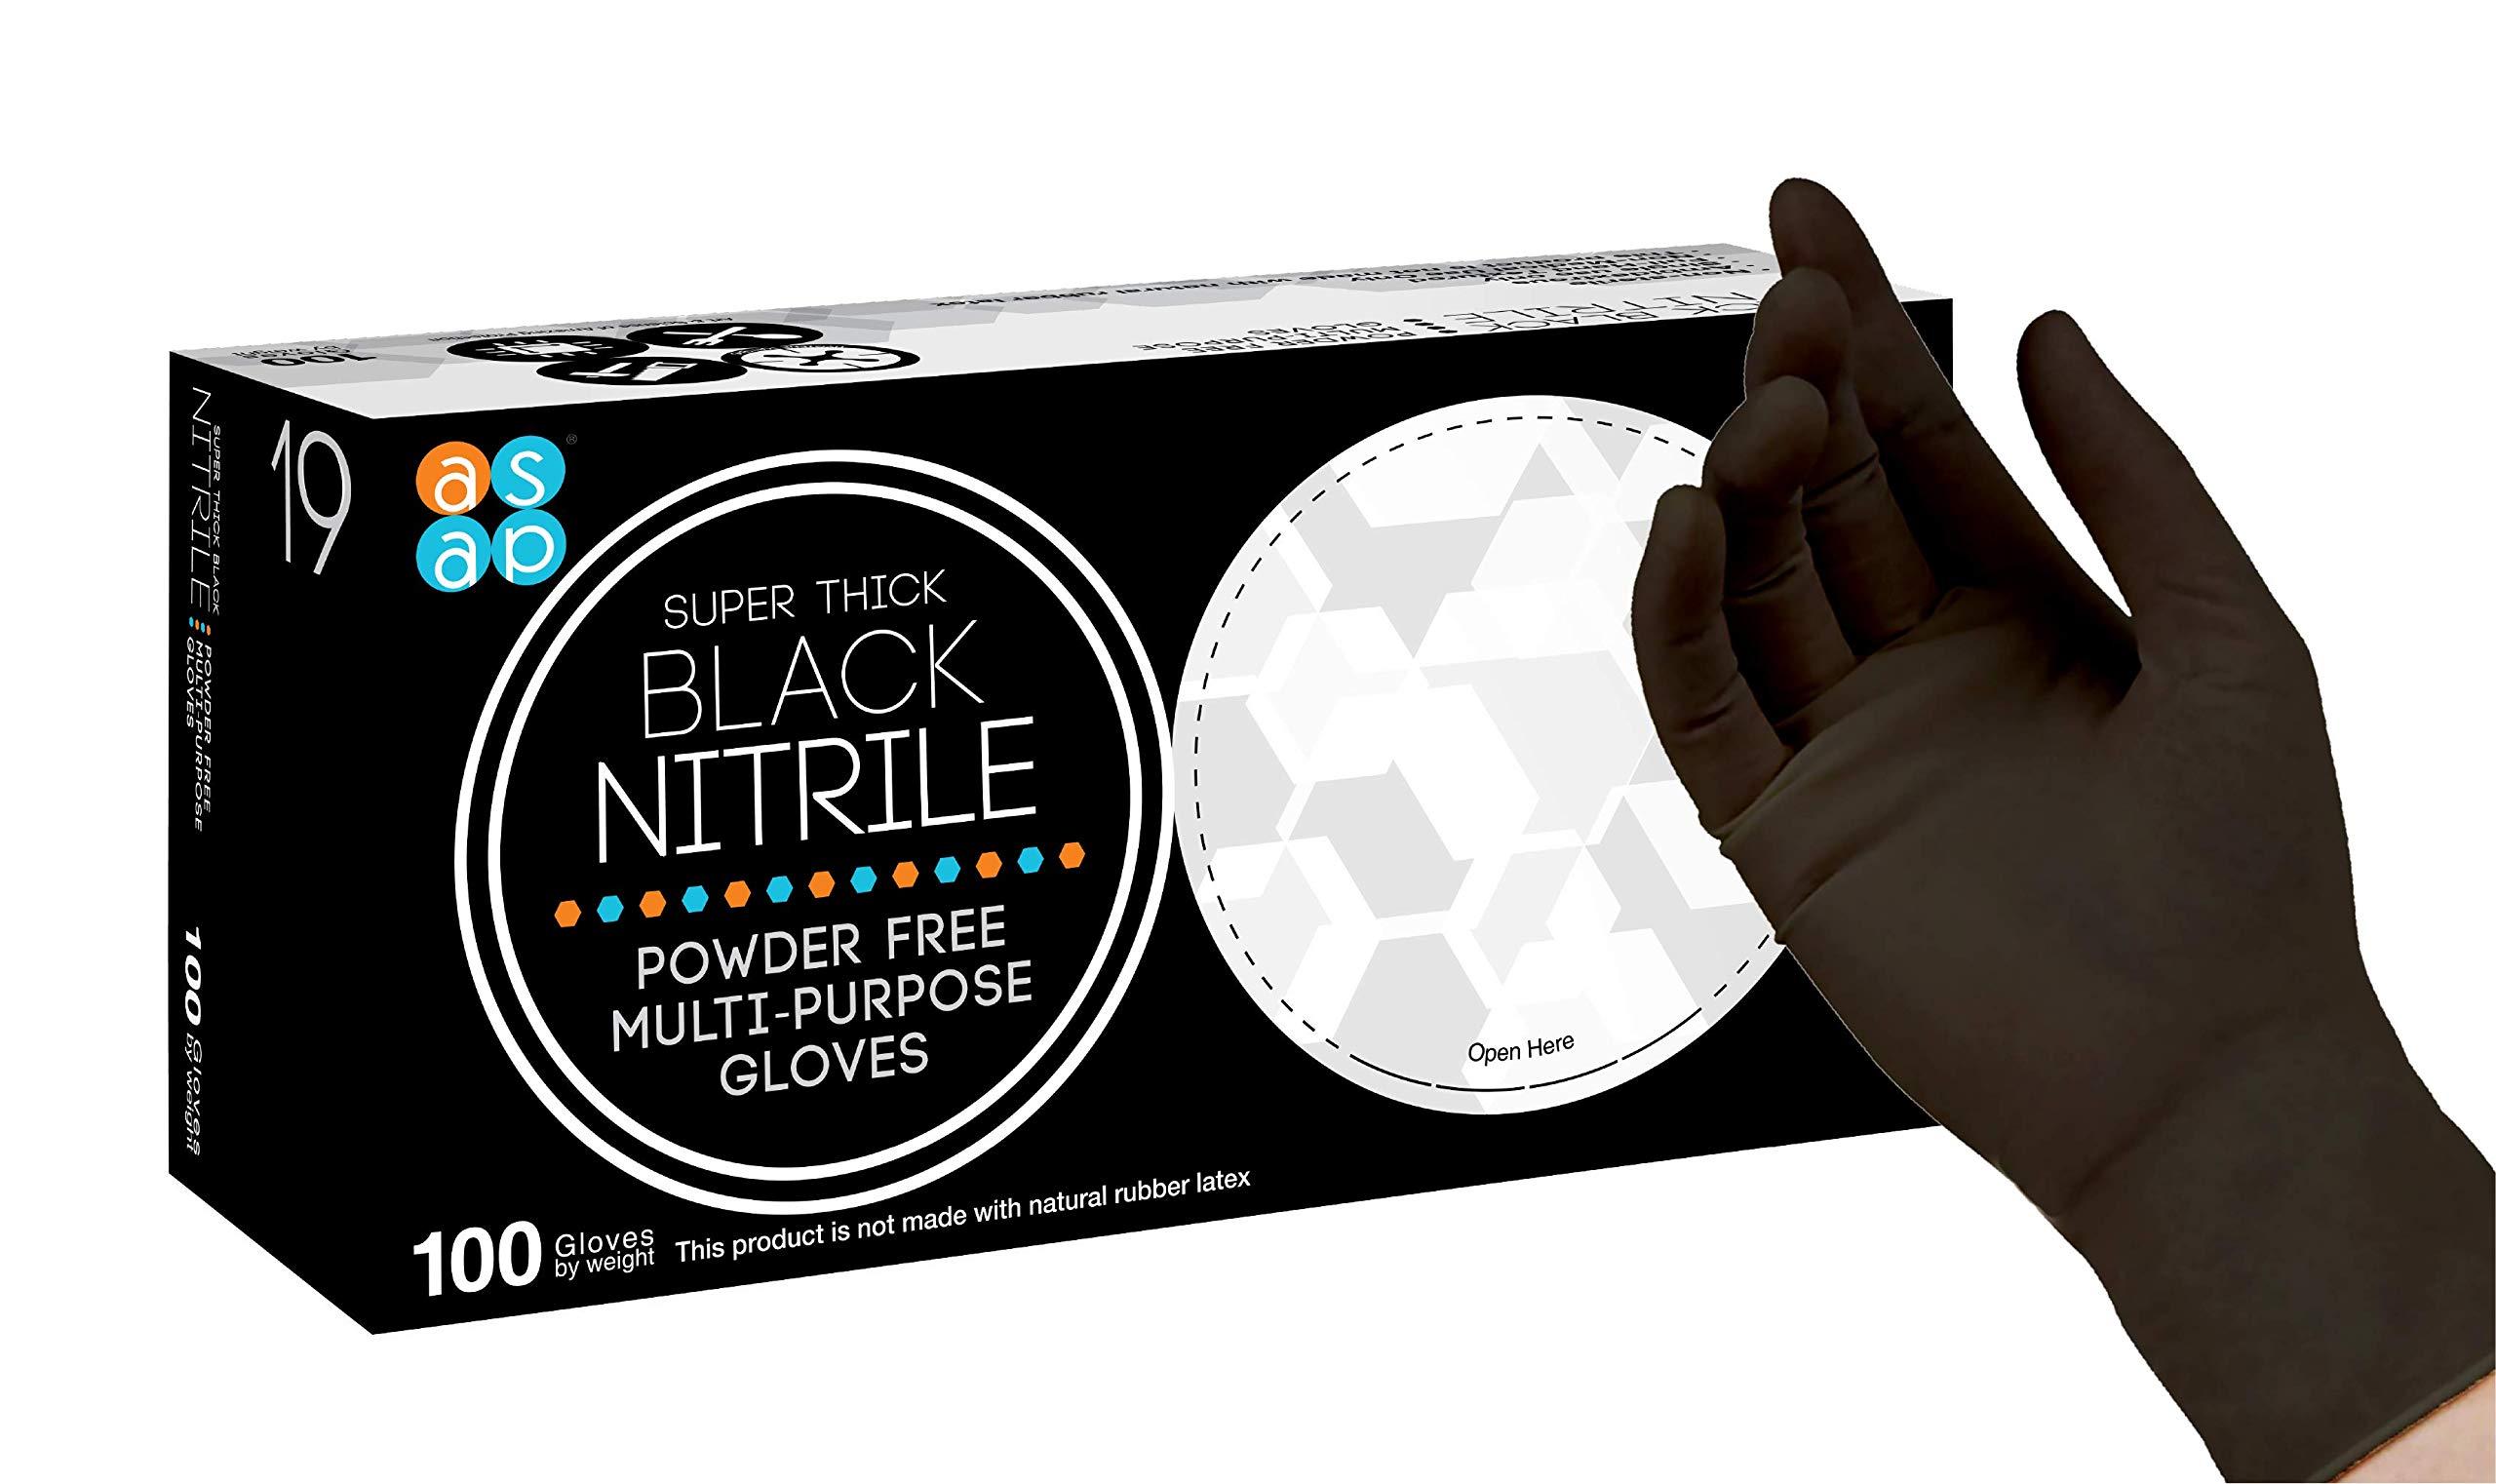 ASAP Black Nitrile Powder Free Industrial Multi-Purpose Gloves, Disposable, 5.5 mil, Black (XX-Large - Box of 100)